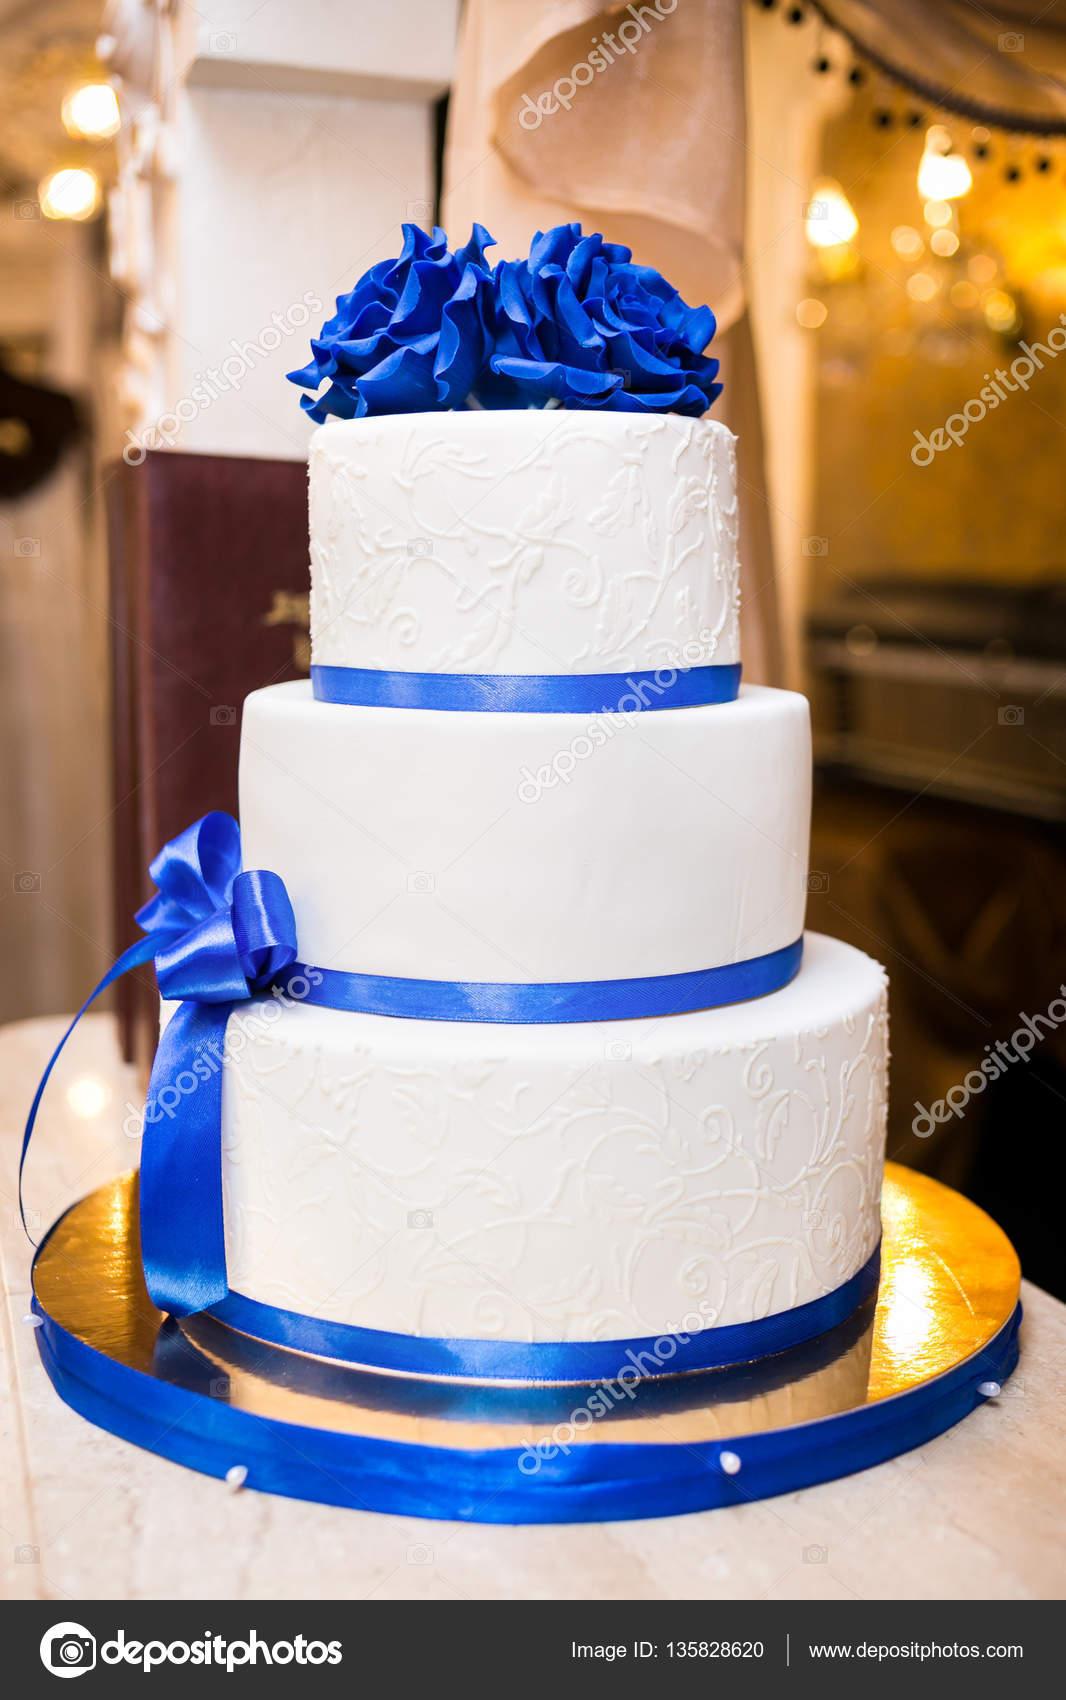 wedding cake, festive multi-storey cake, a cake in white and blue ...